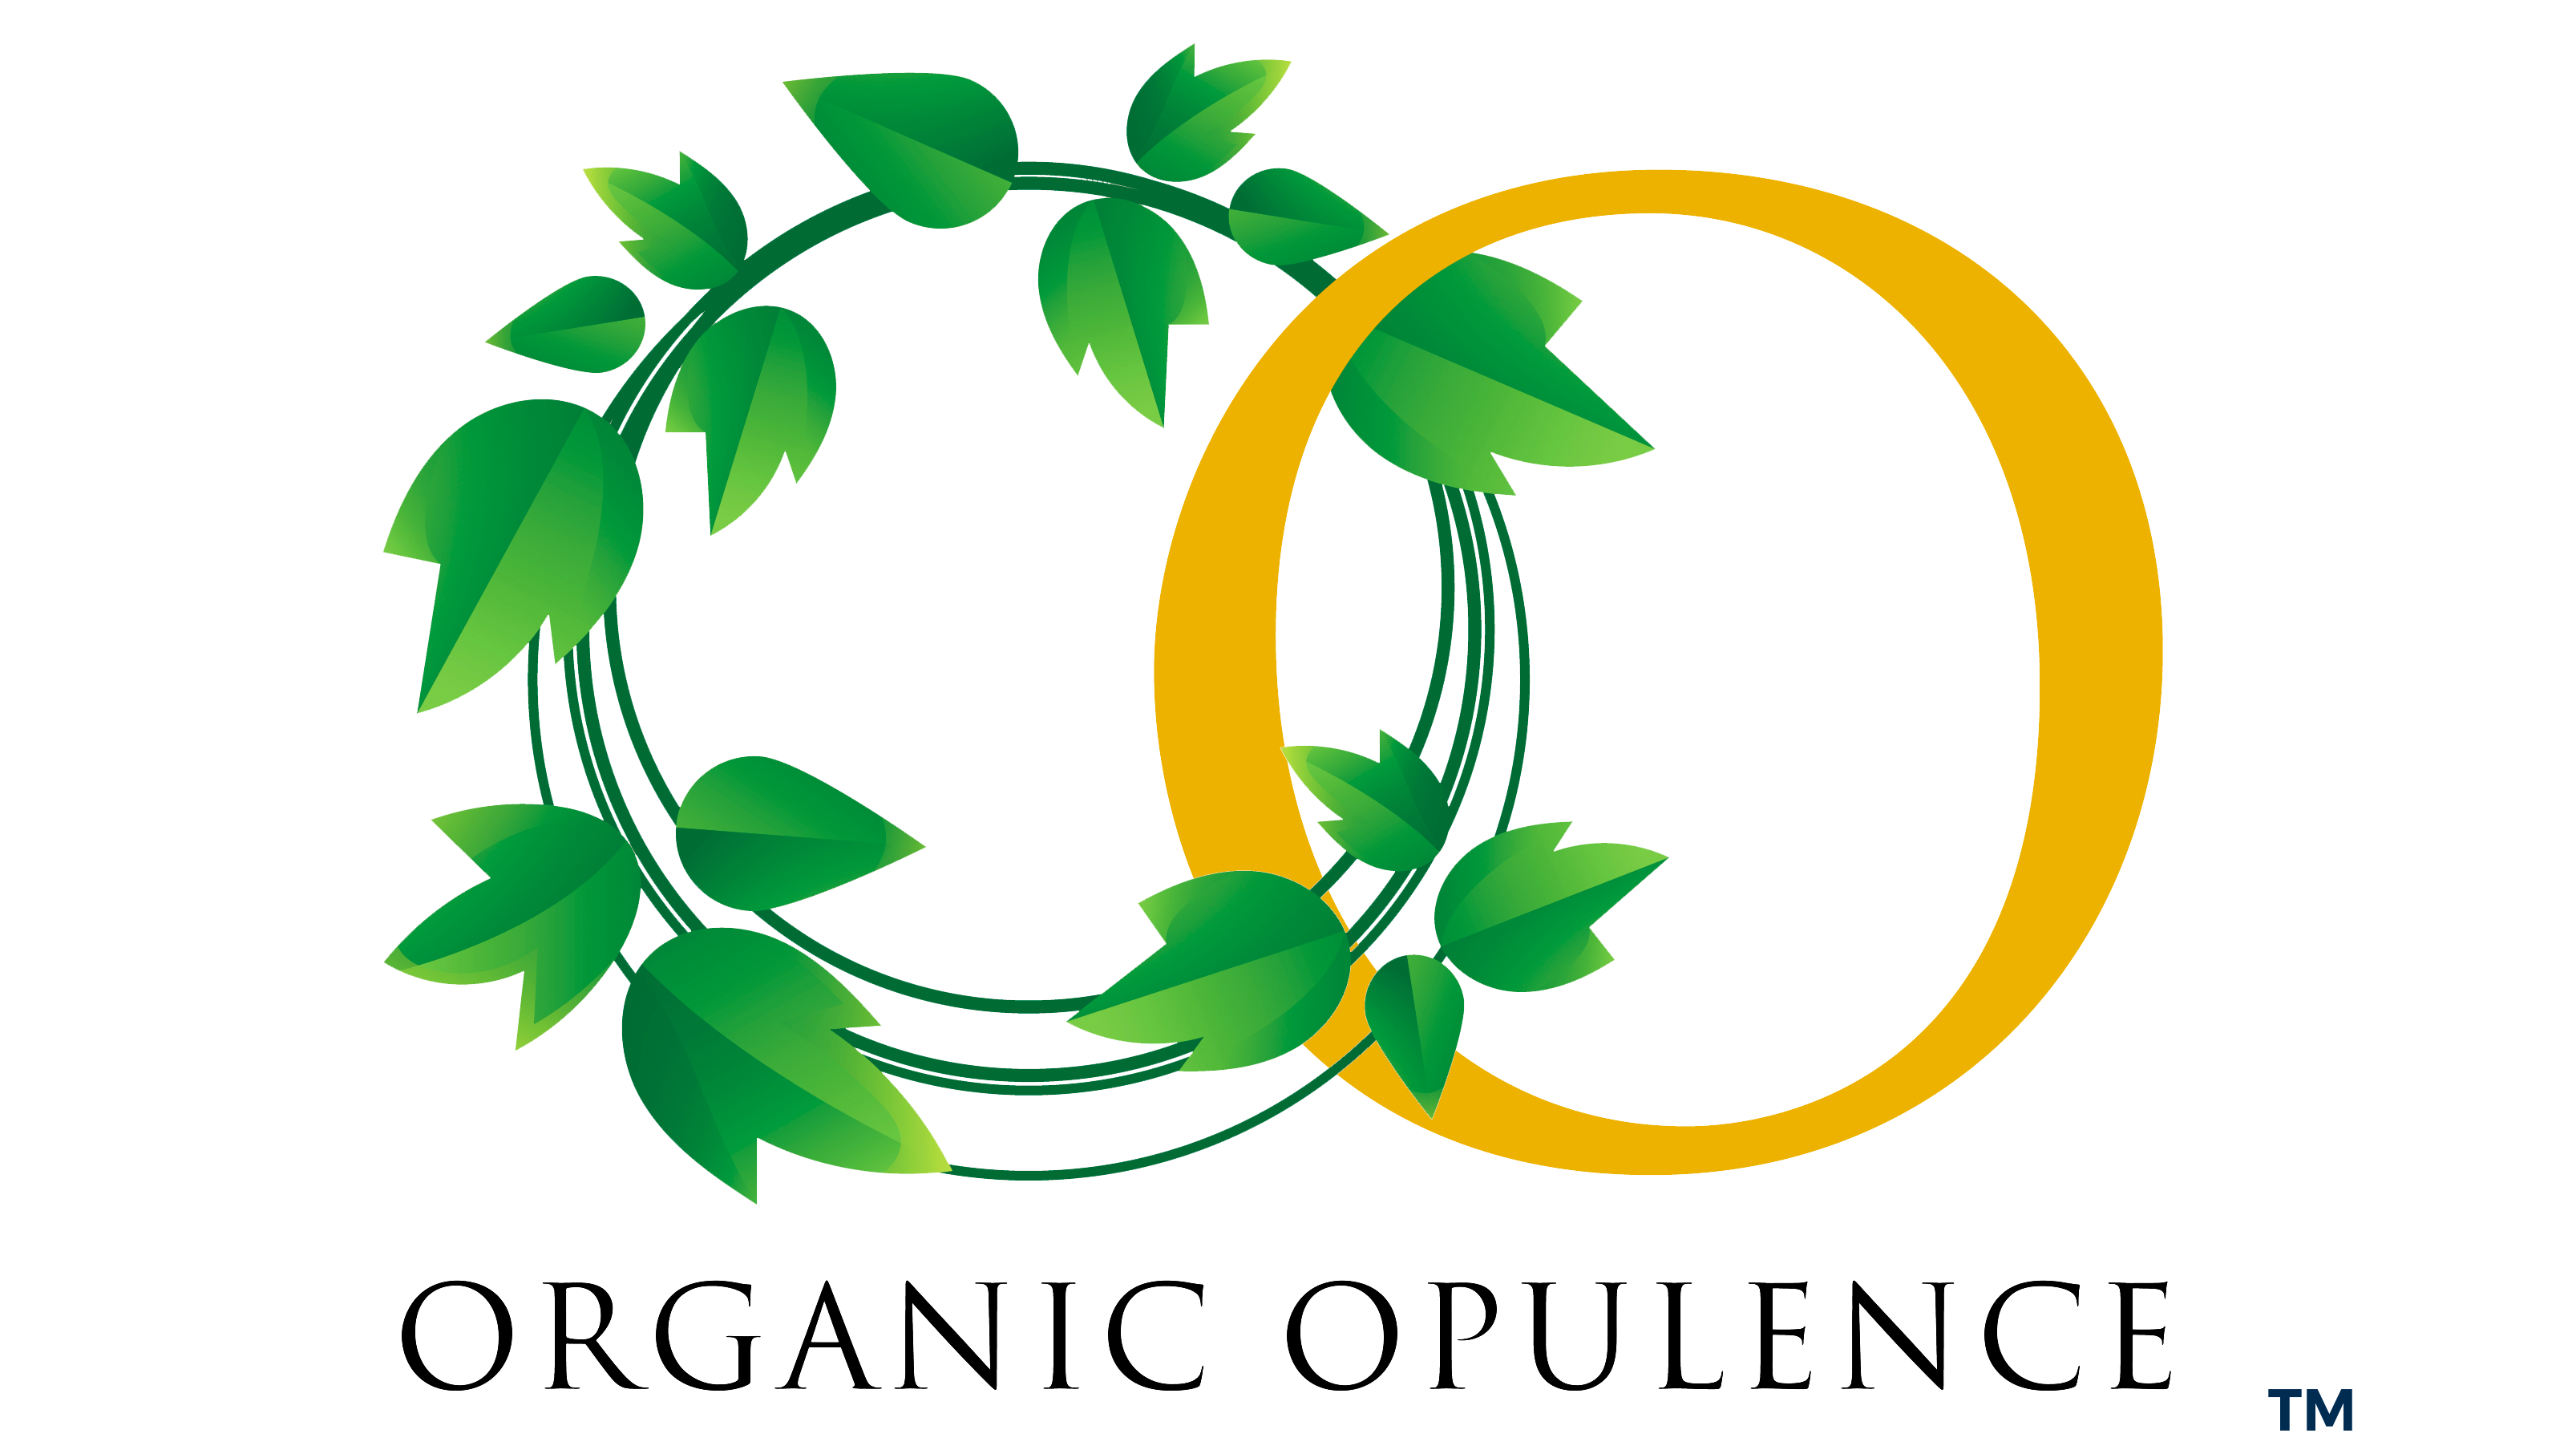 Organic Opulence